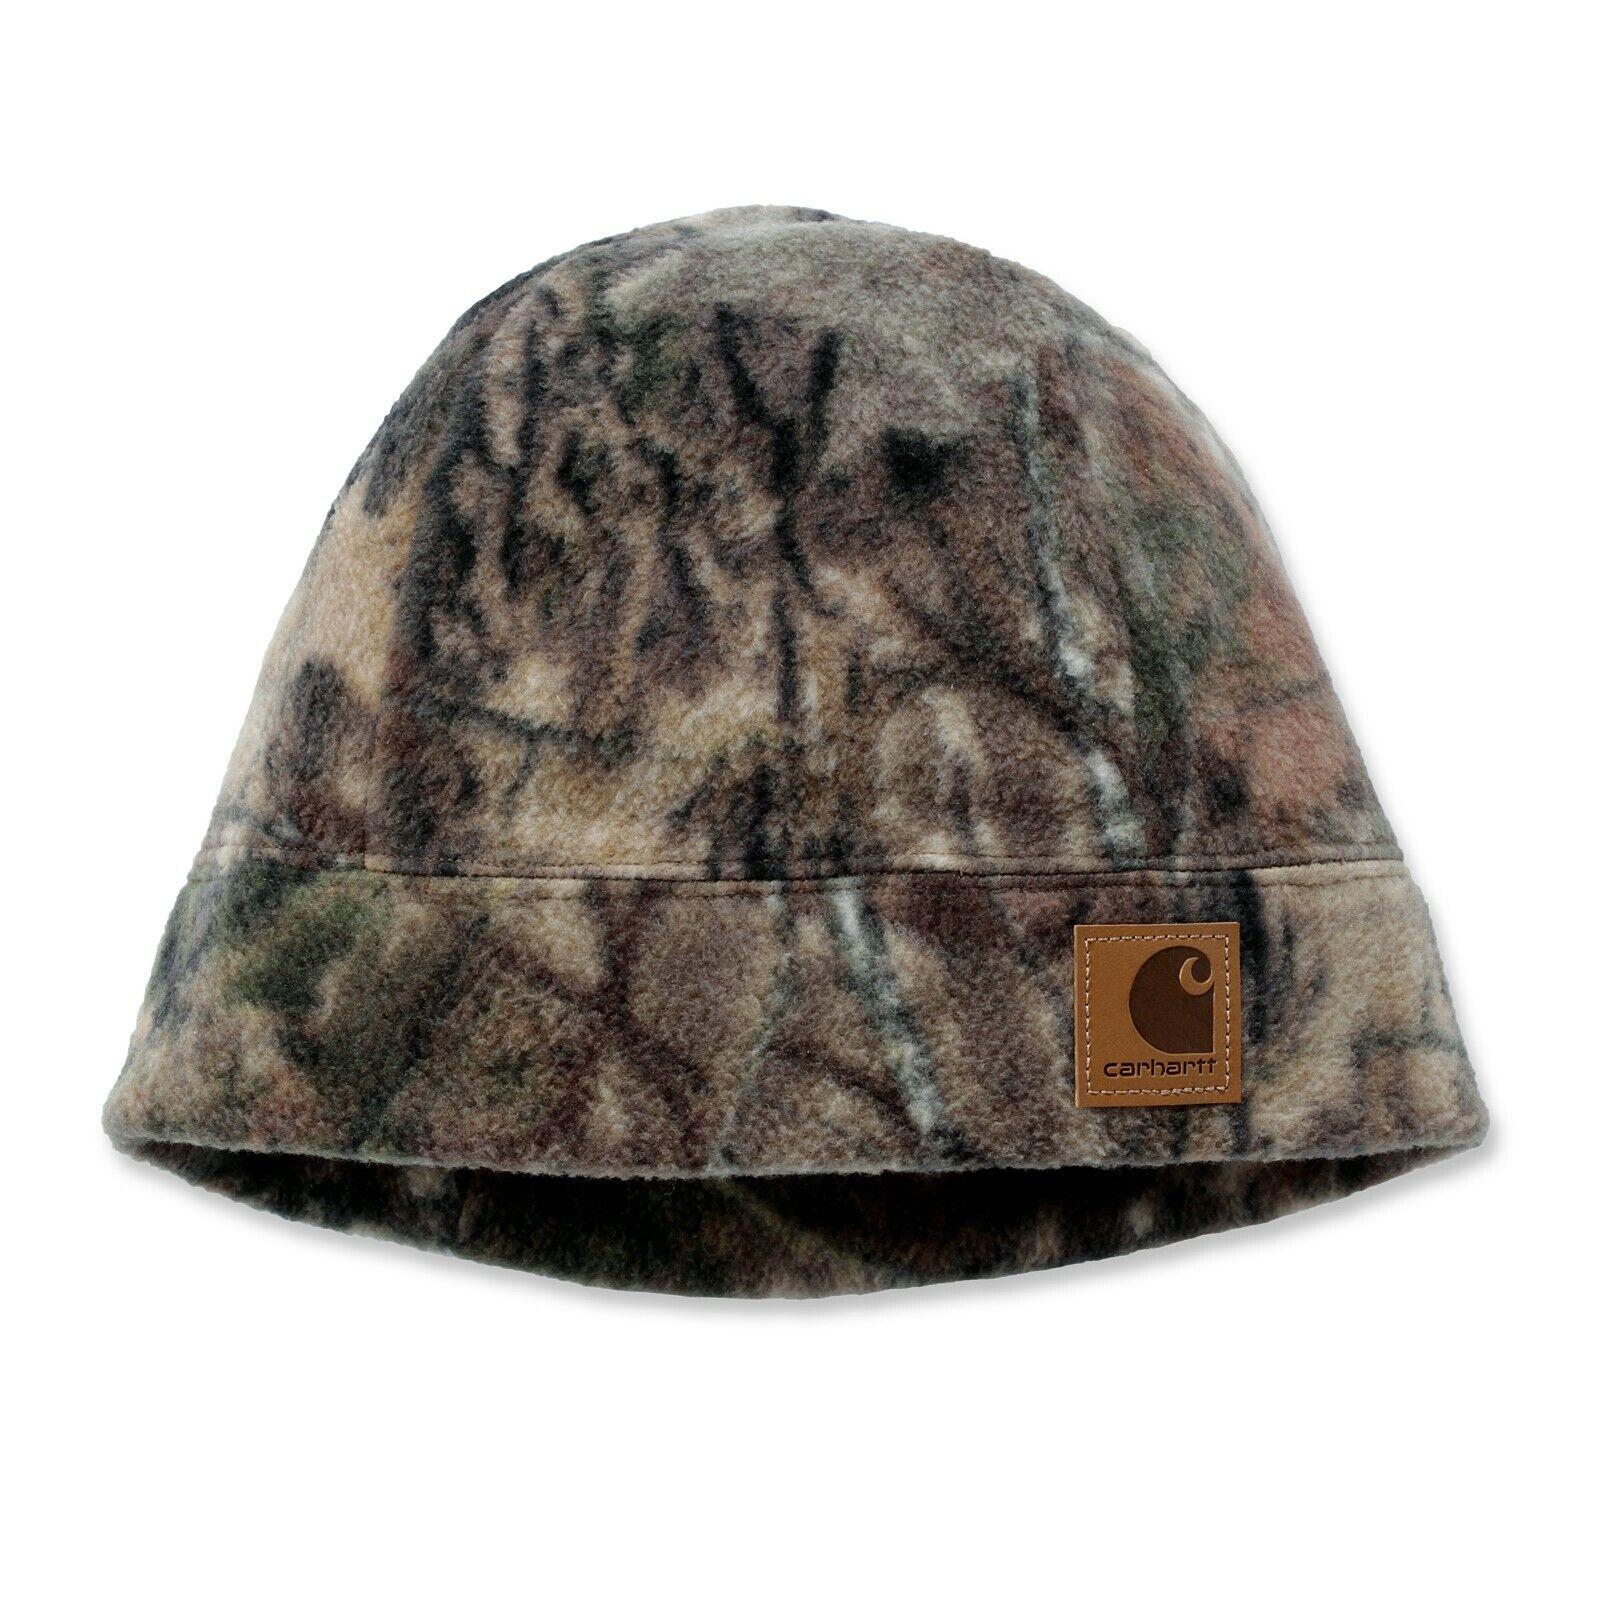 Carhartt Camo Fleece Hat   Mütze mit Tarnmuster   camouflage   A294   Ltd. Ed.